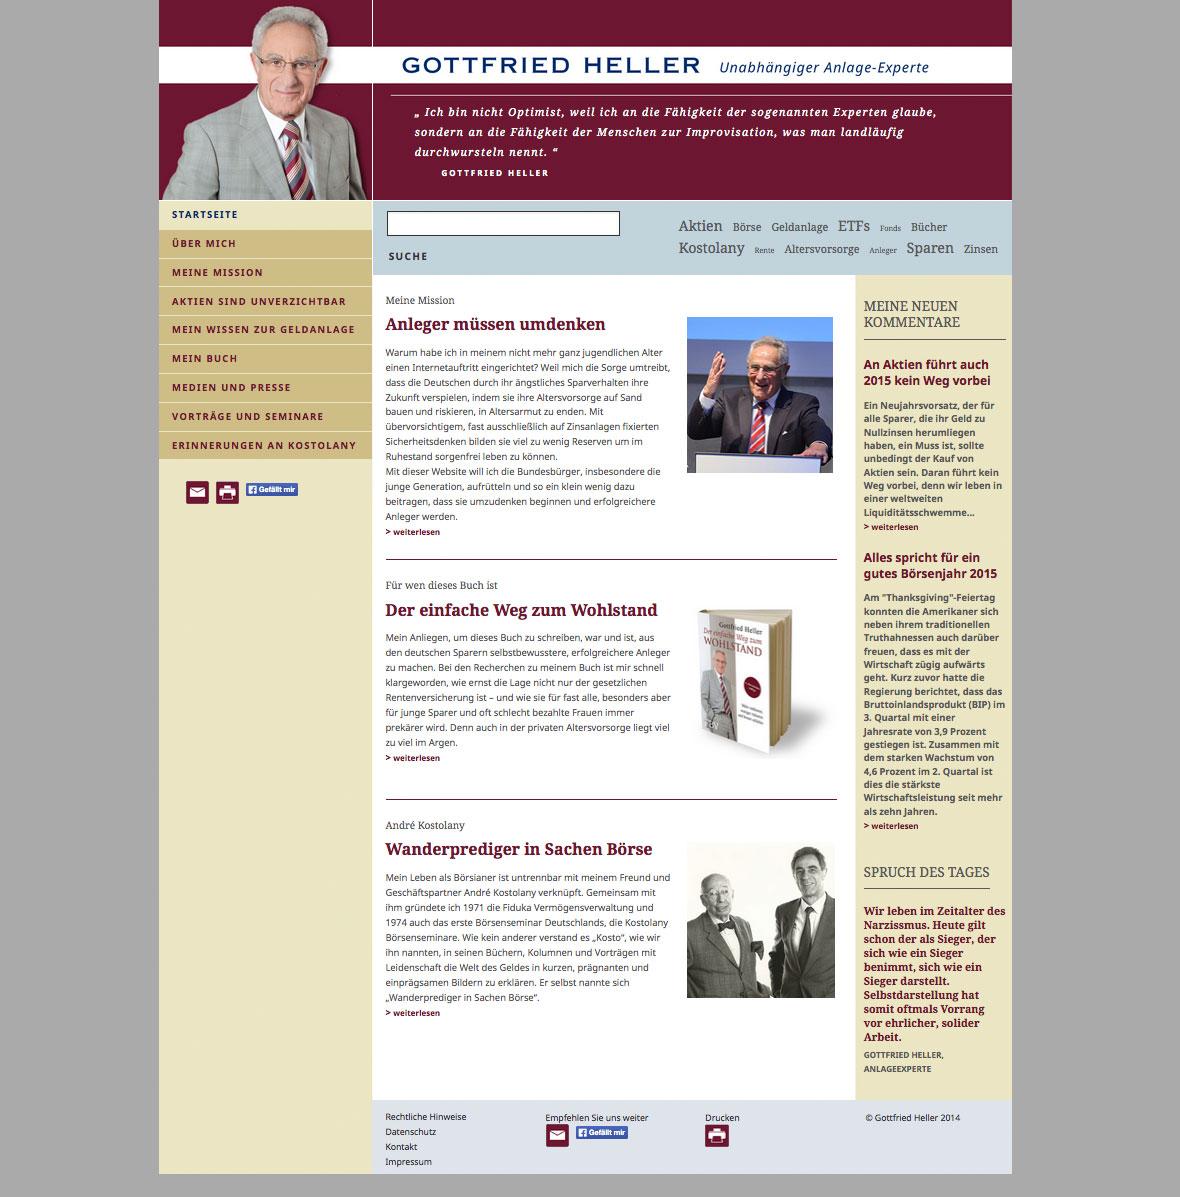 punktneun-Gottfried-Heller-Webseite-Startseite